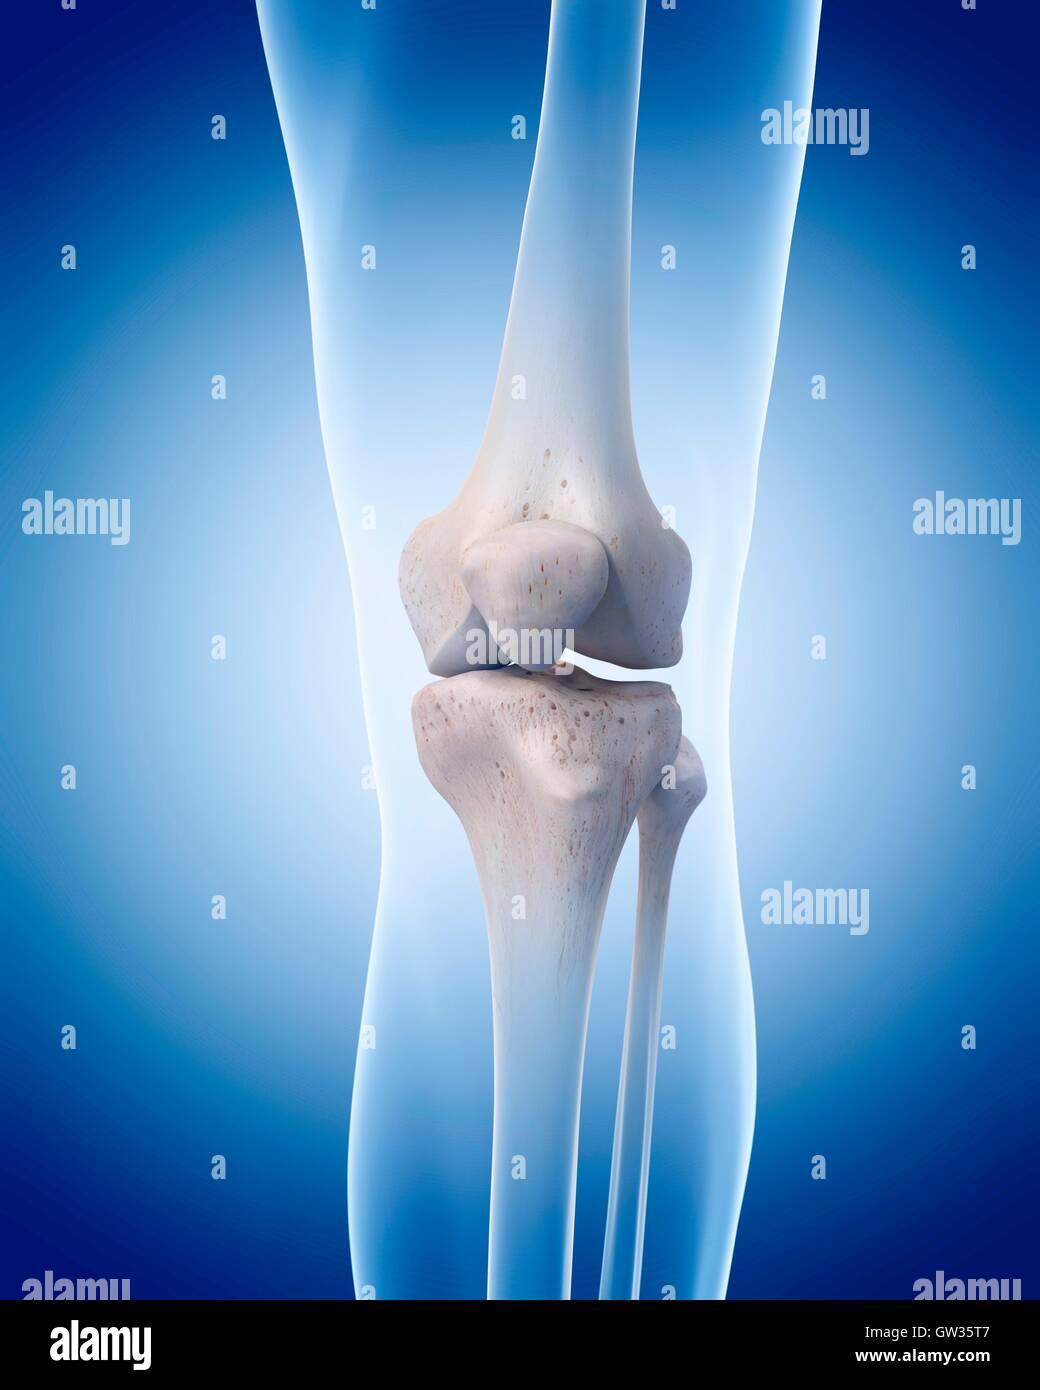 Patella Bones Imágenes De Stock & Patella Bones Fotos De Stock - Alamy